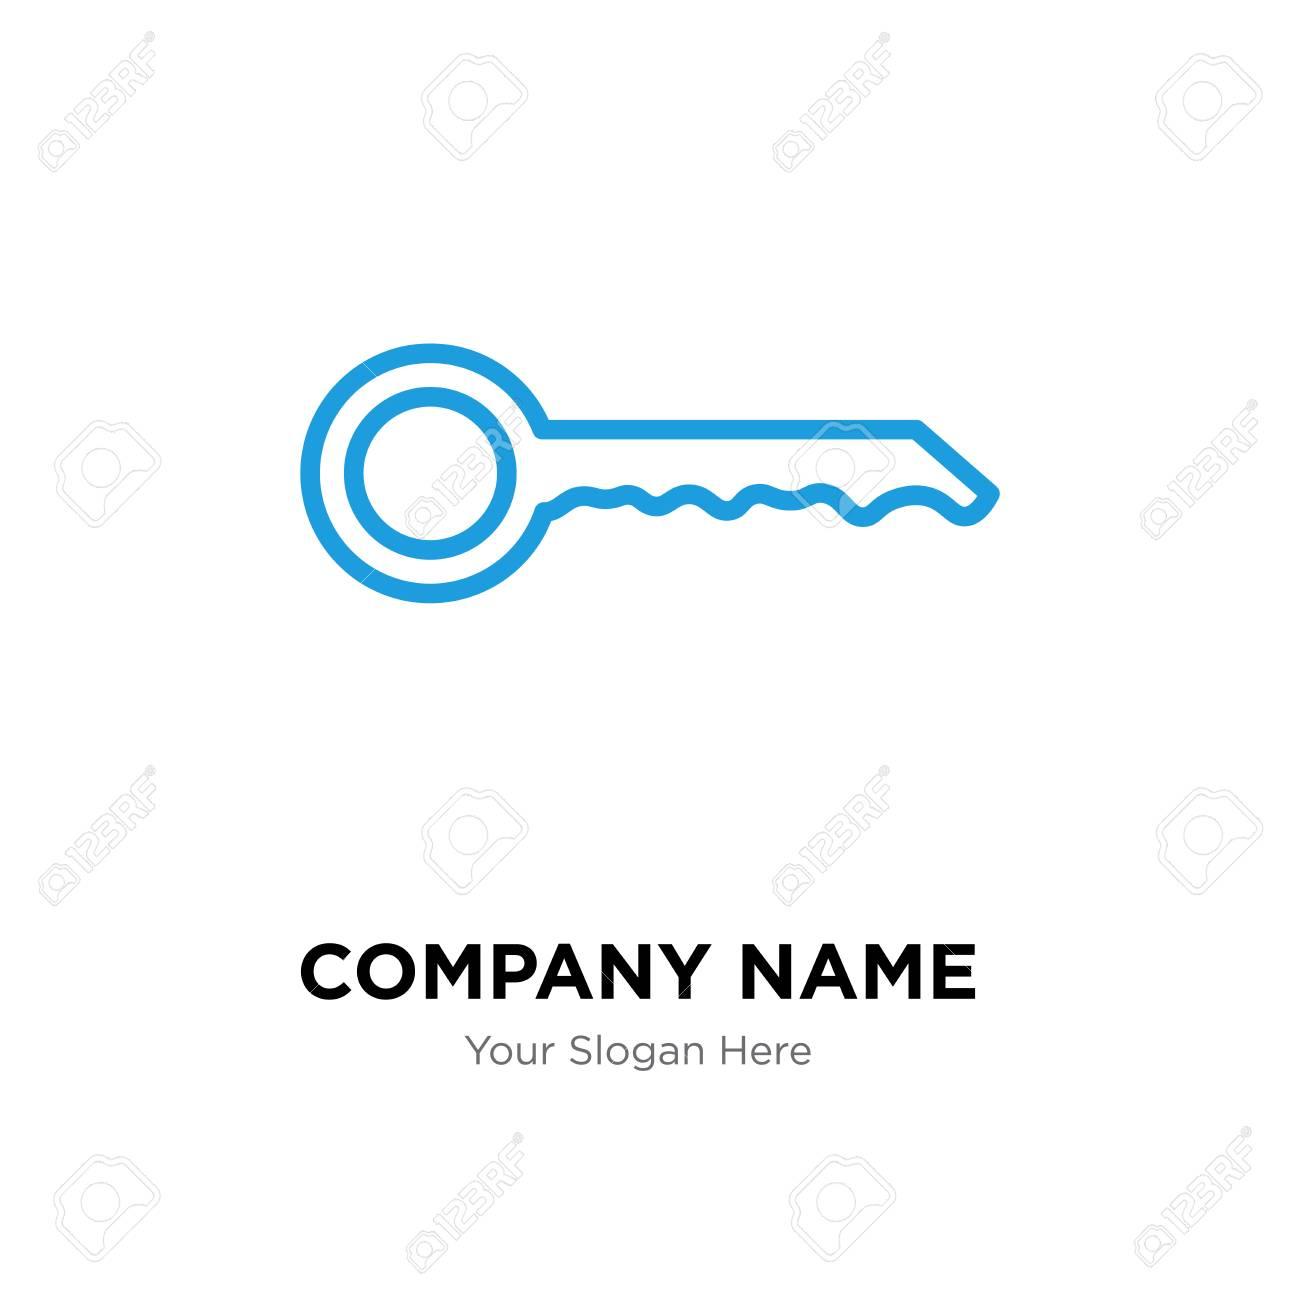 Car Key Company Logo Design Template Car Key Logotype Vector Royalty Free Cliparts Vectors And Stock Illustration Image 106269560